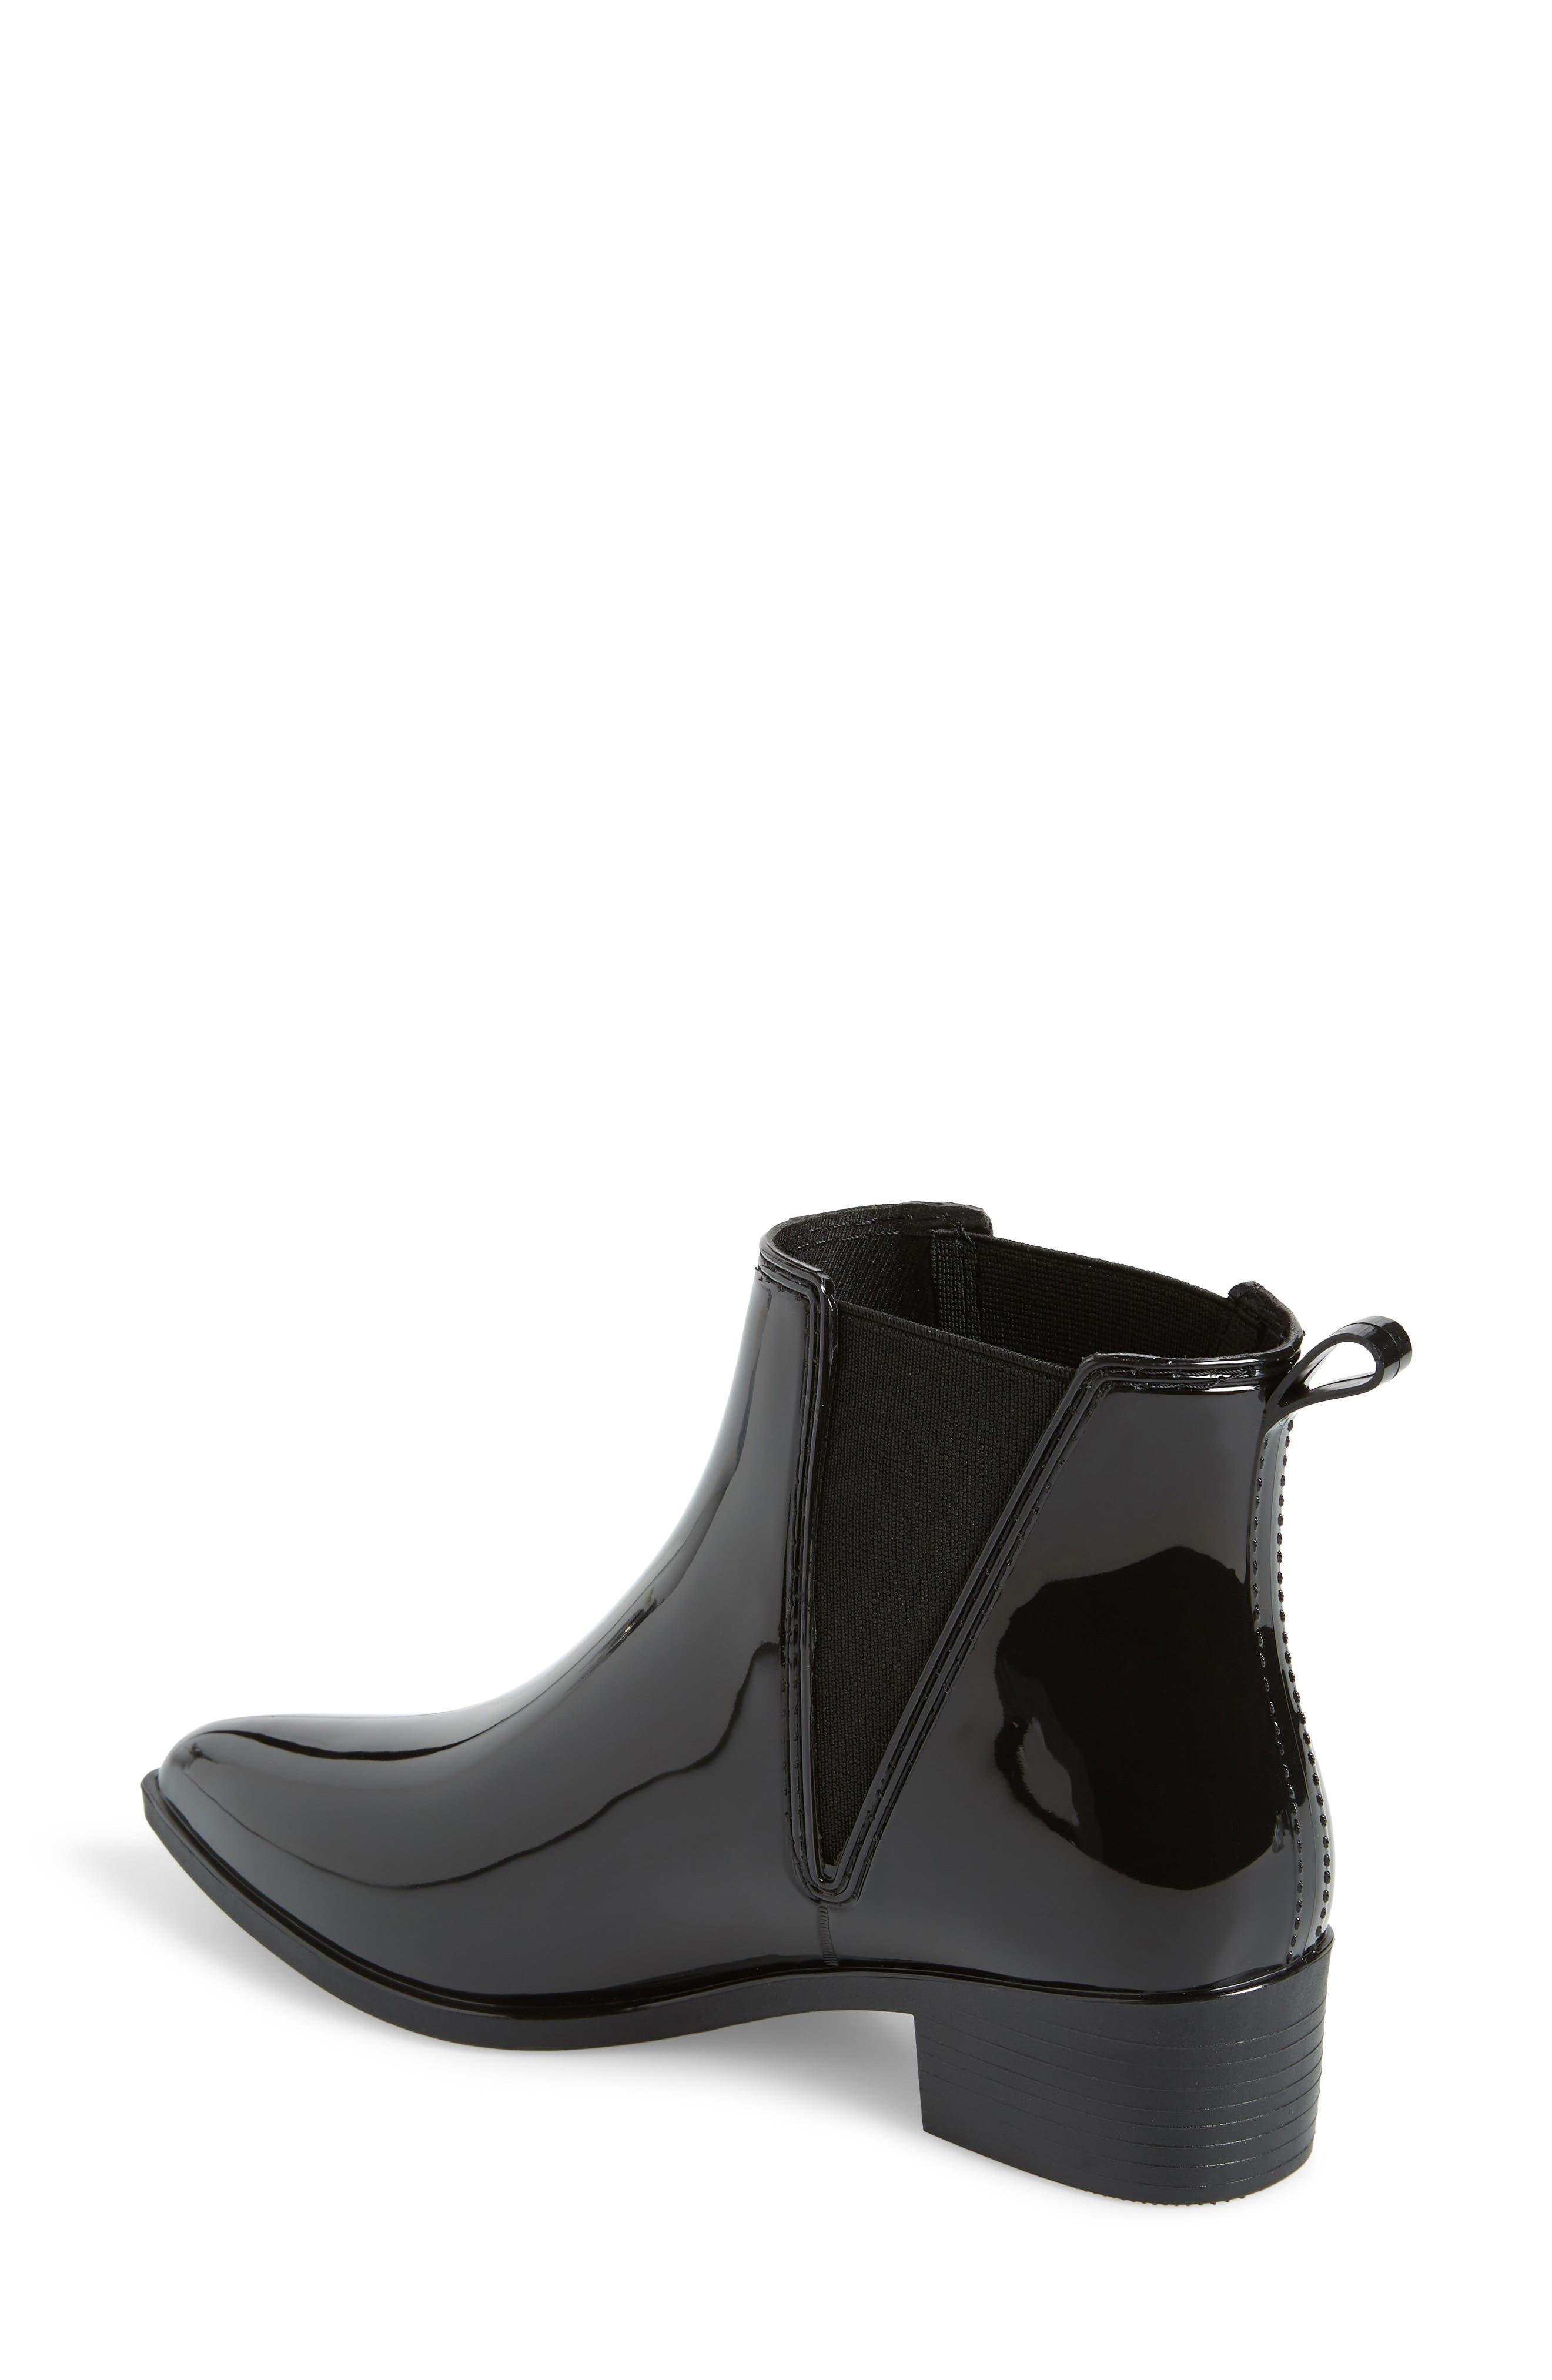 Mist Chelsea Waterproof Rain Boot,                             Alternate thumbnail 2, color,                             BLACK SHINY